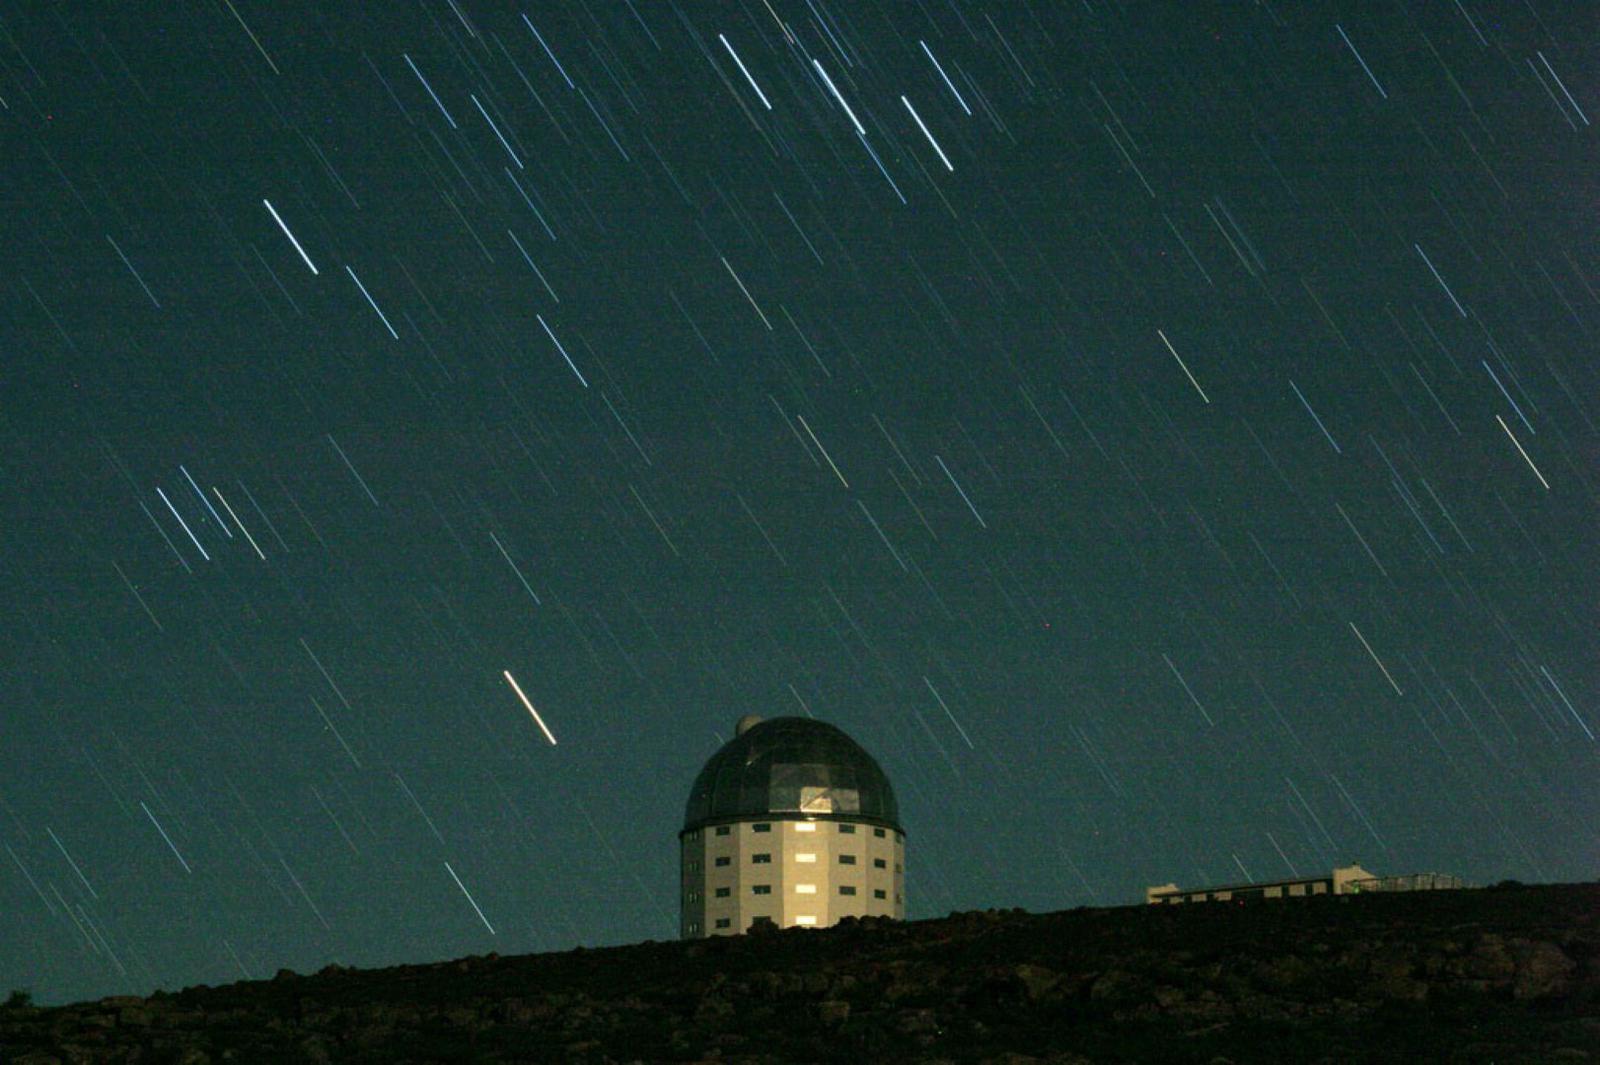 ver las estrellas turismo astronomico stargazing salttrails